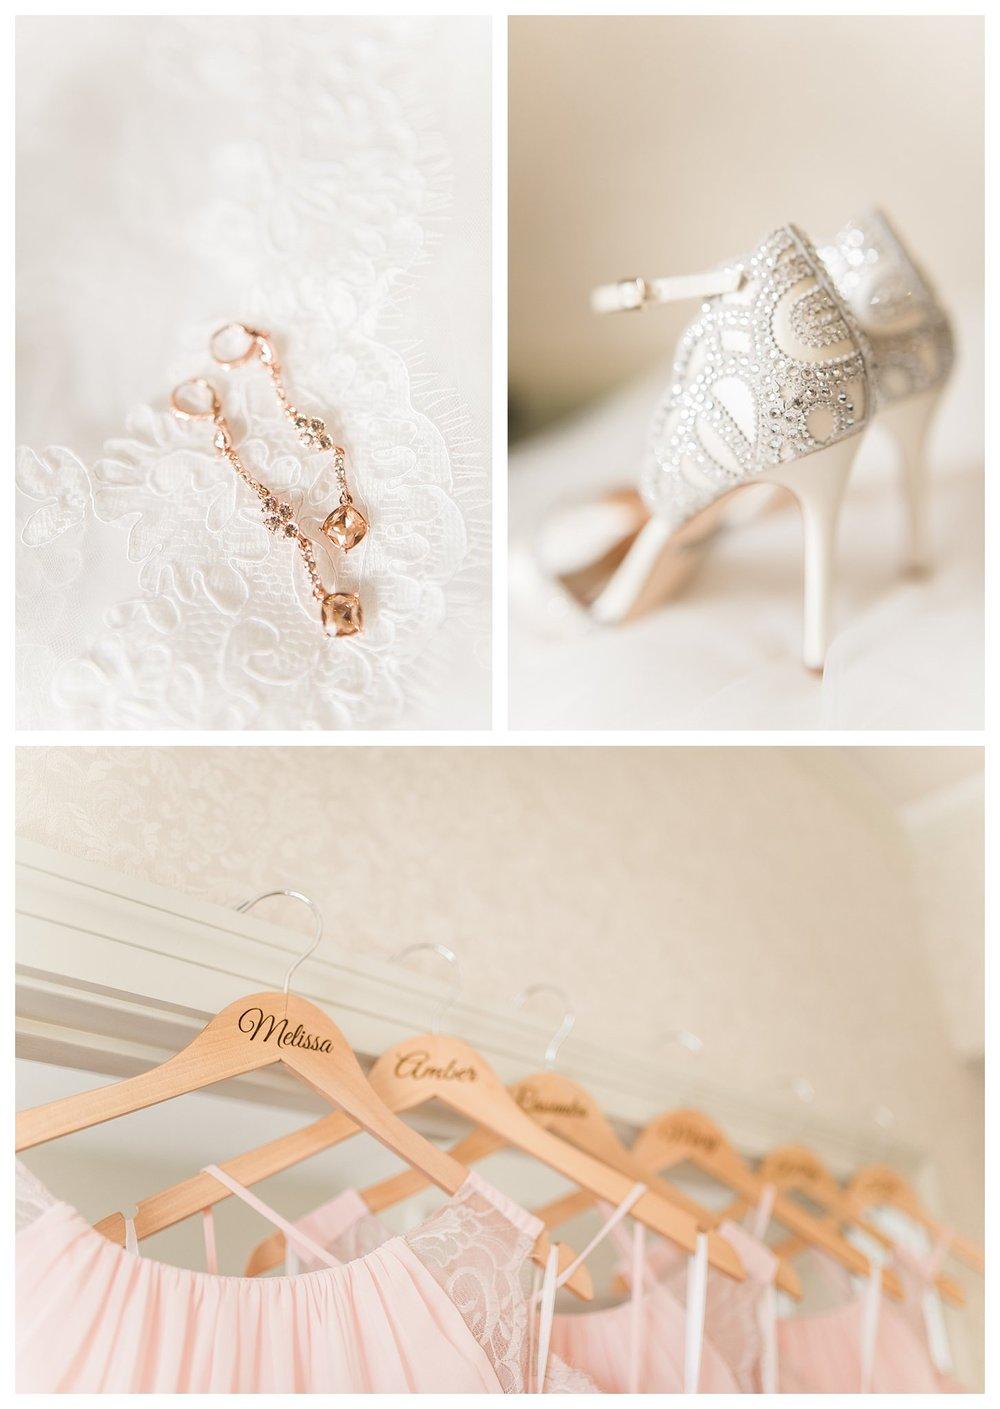 rhinegeist-wedding-everleigh-photography-cincinnati-wedding-photographer-the-singhoff-wedding-02